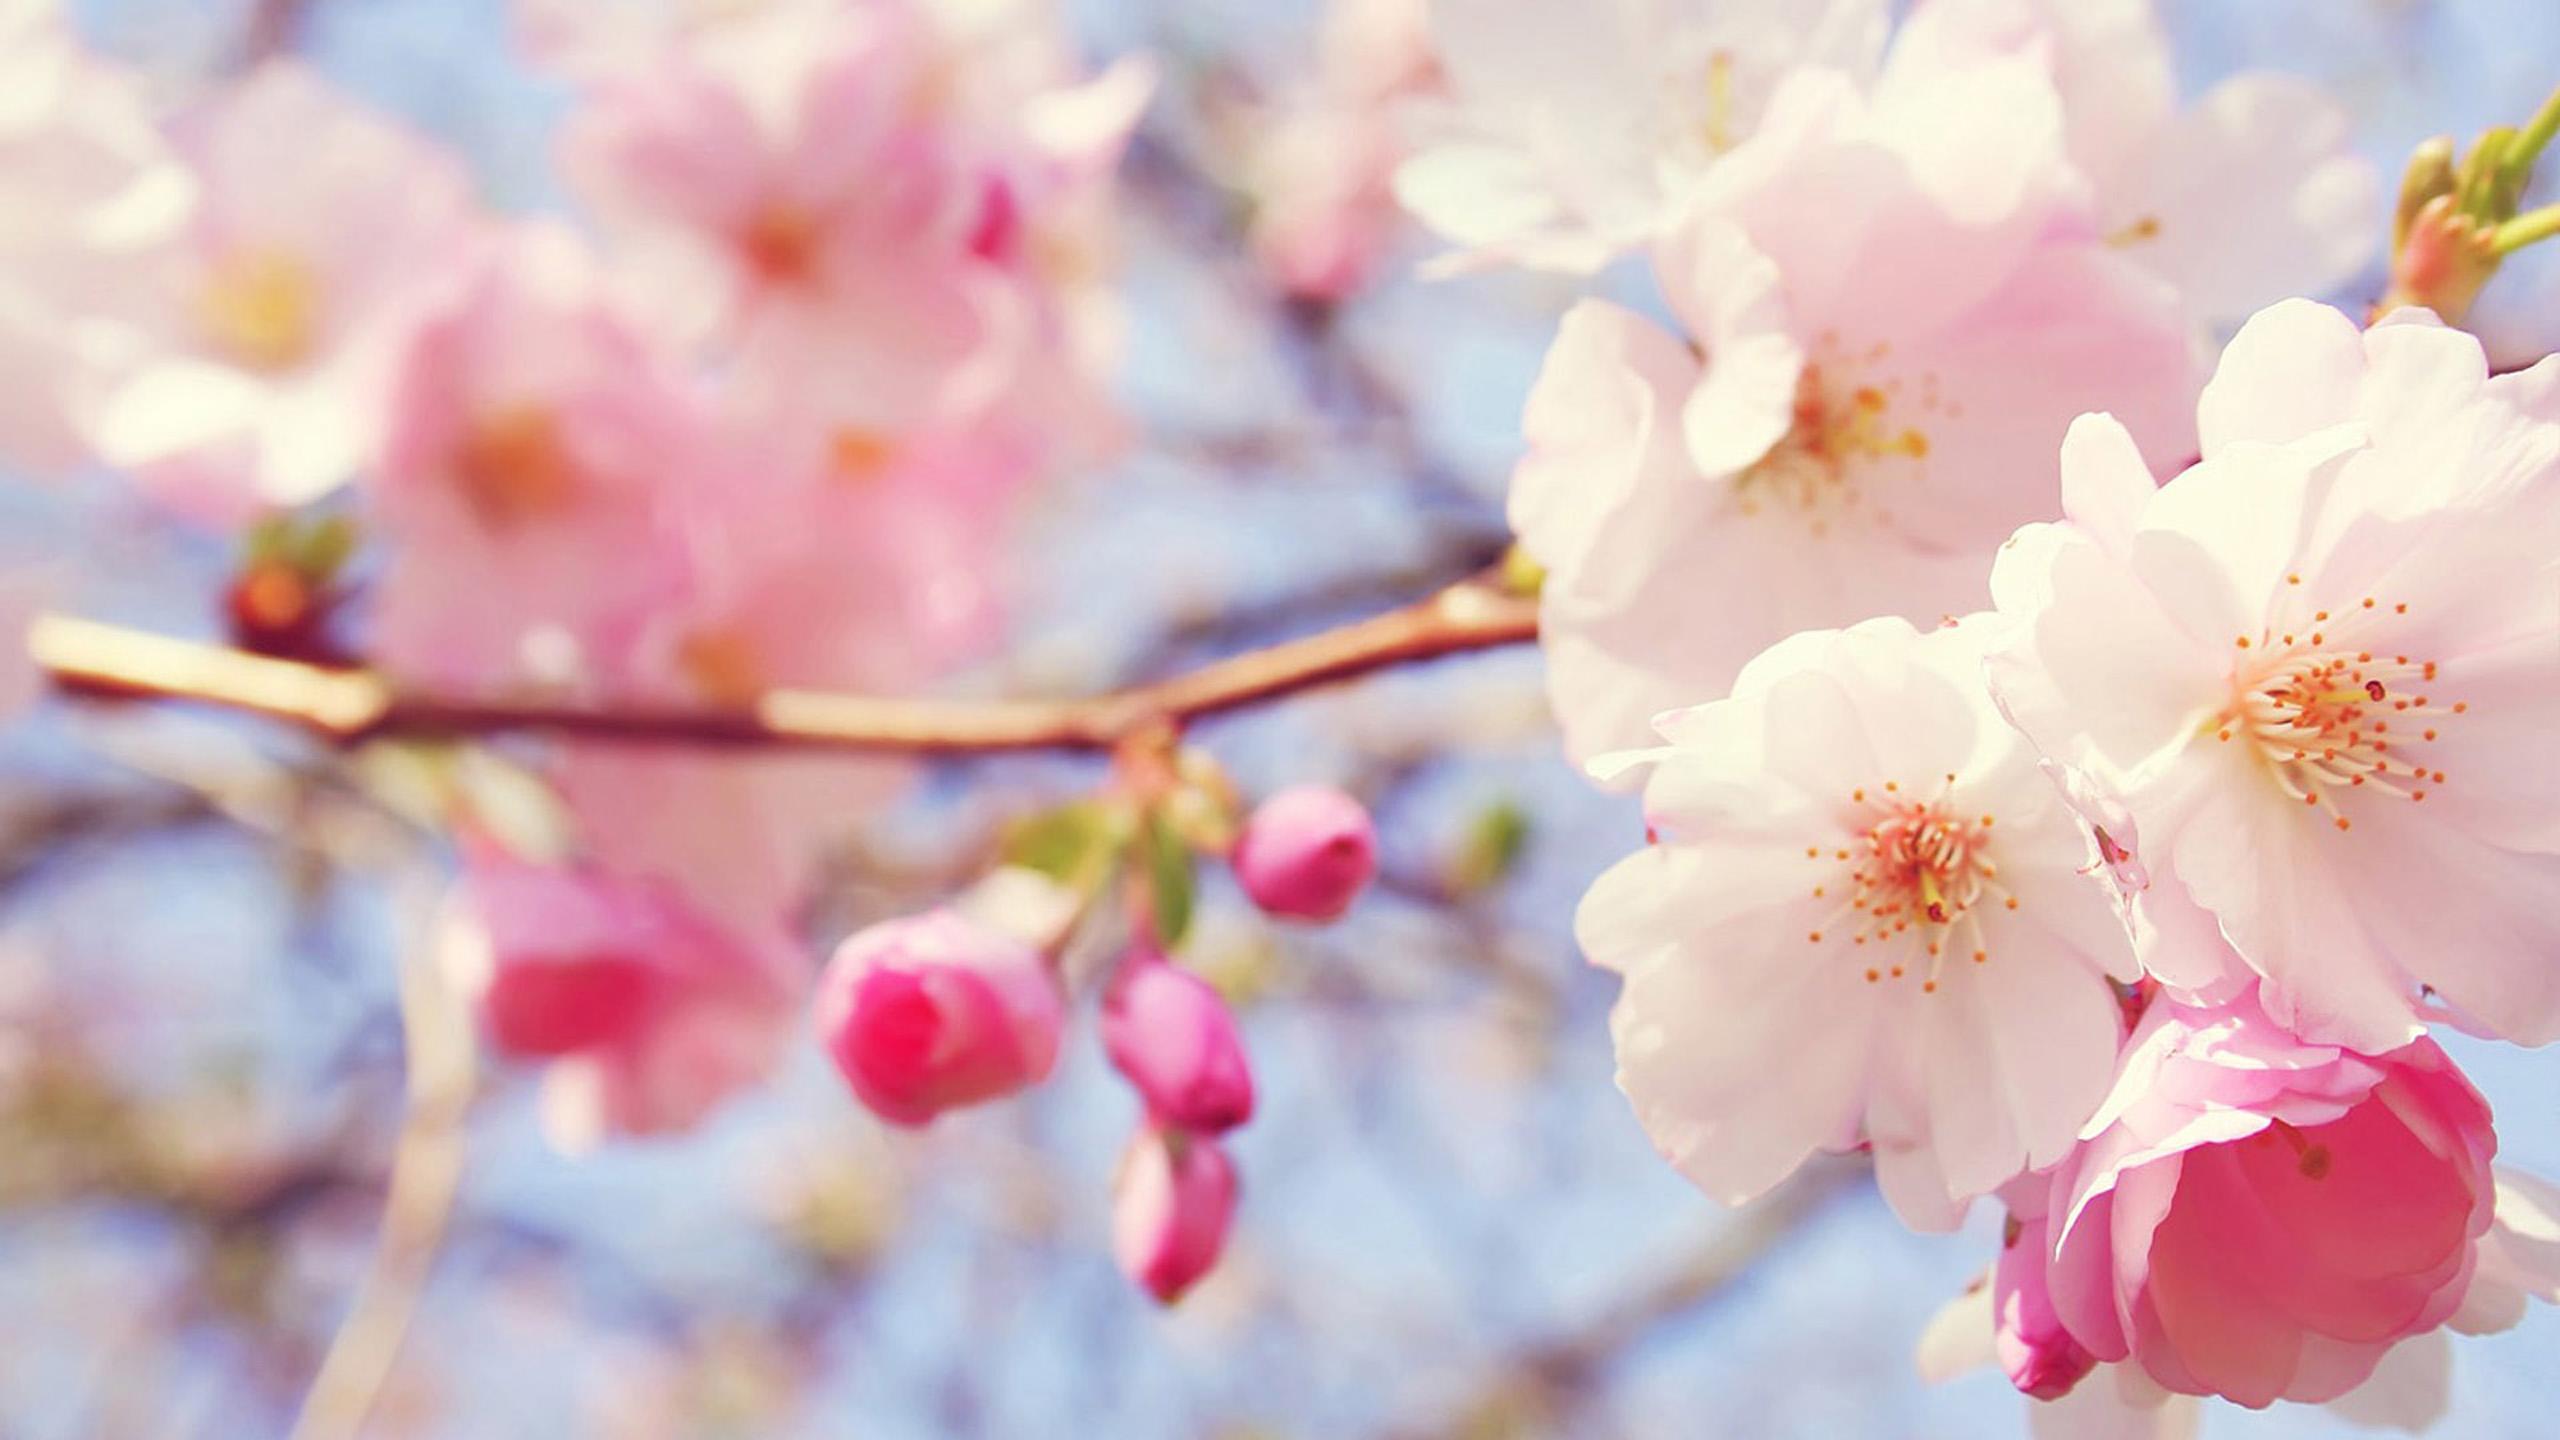 Beautiful Flowers Wallpapers 2560x1440